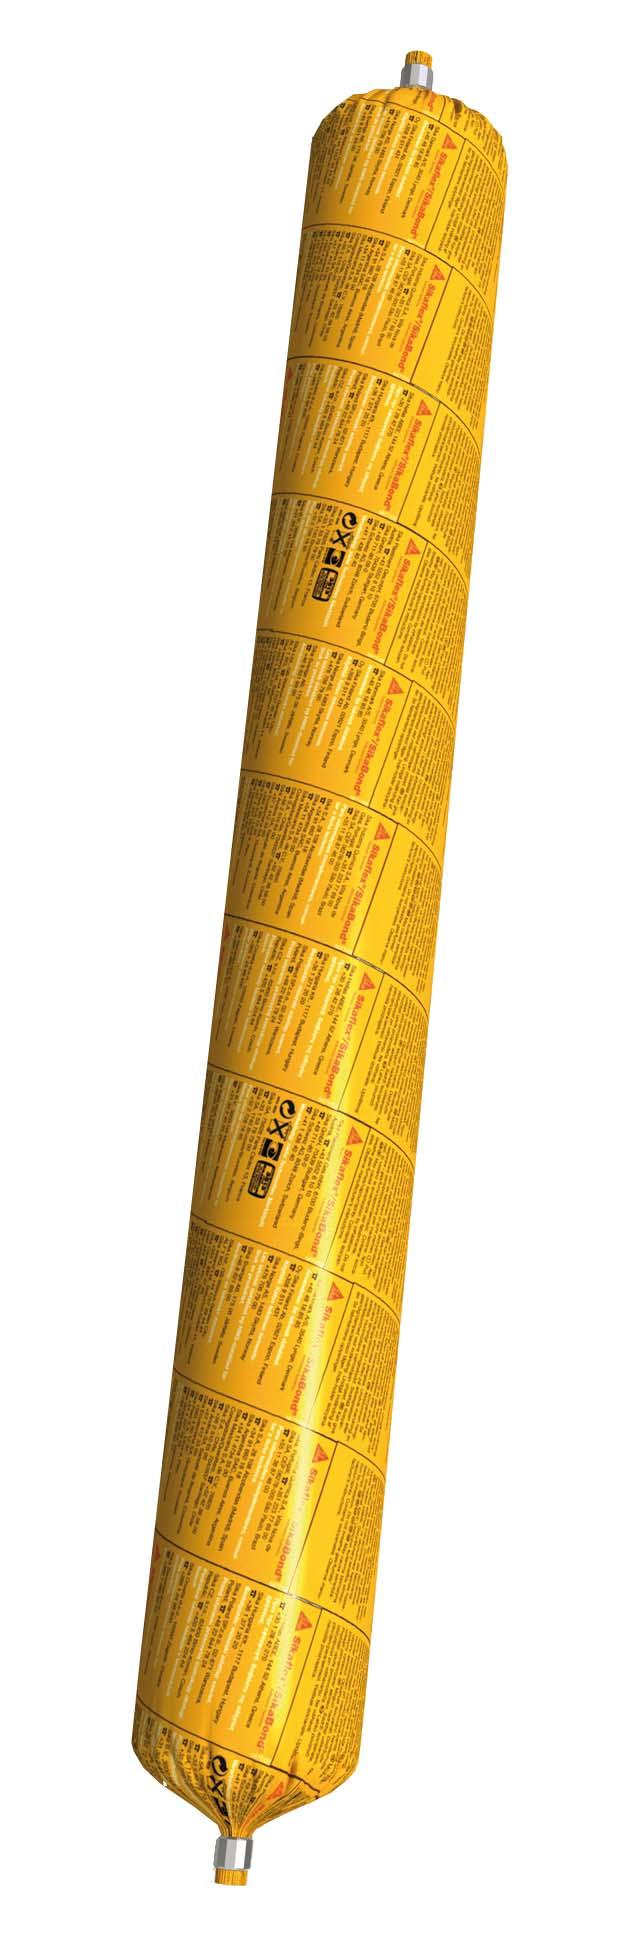 Sikaflex 111 Stick & Seal Karton 20 x 600ml schwarz